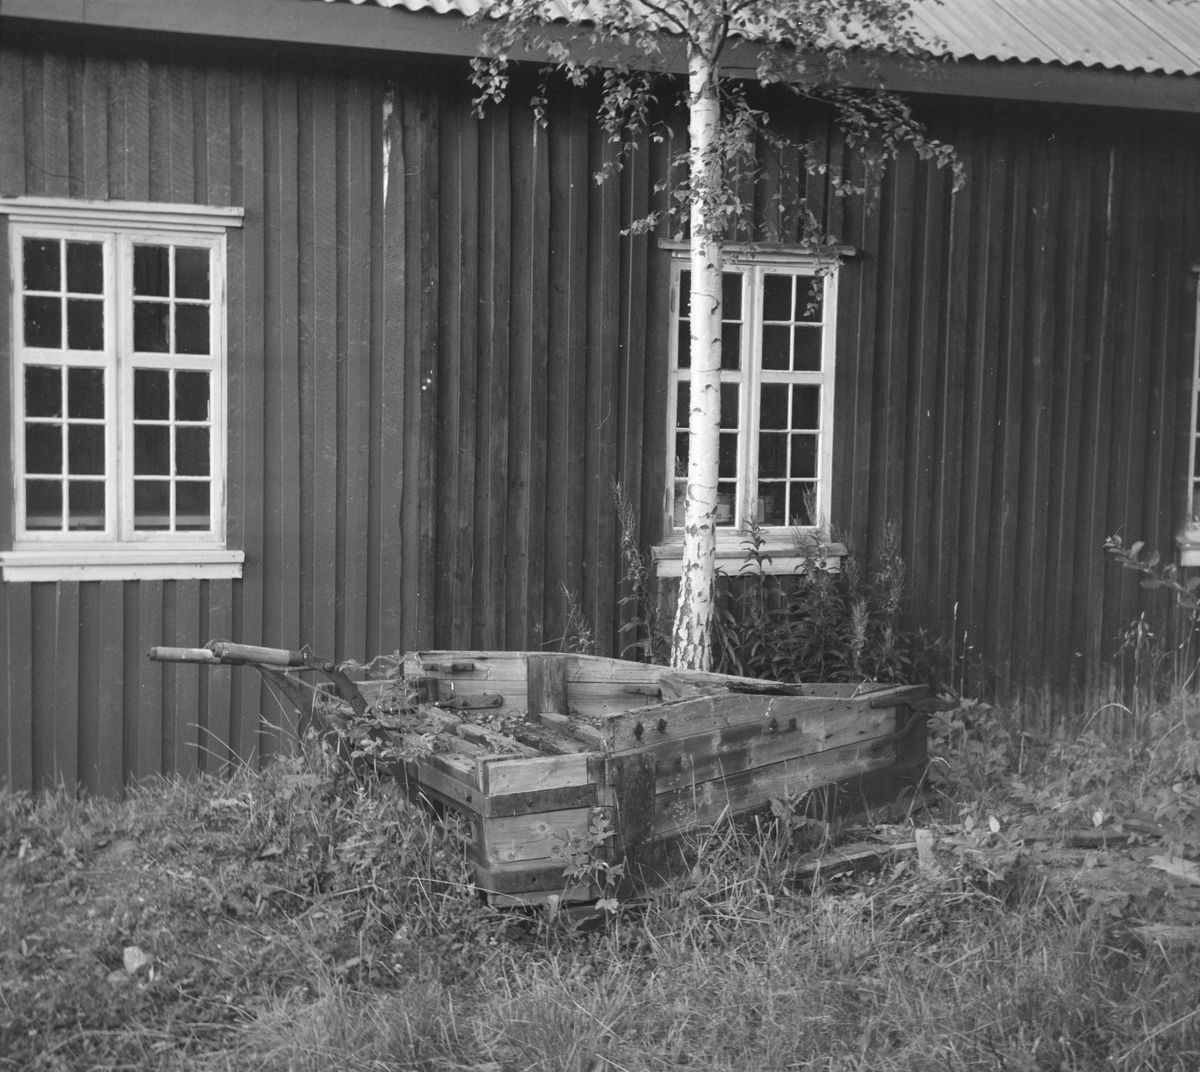 Gammel sporrenser for Solbergfossbanen